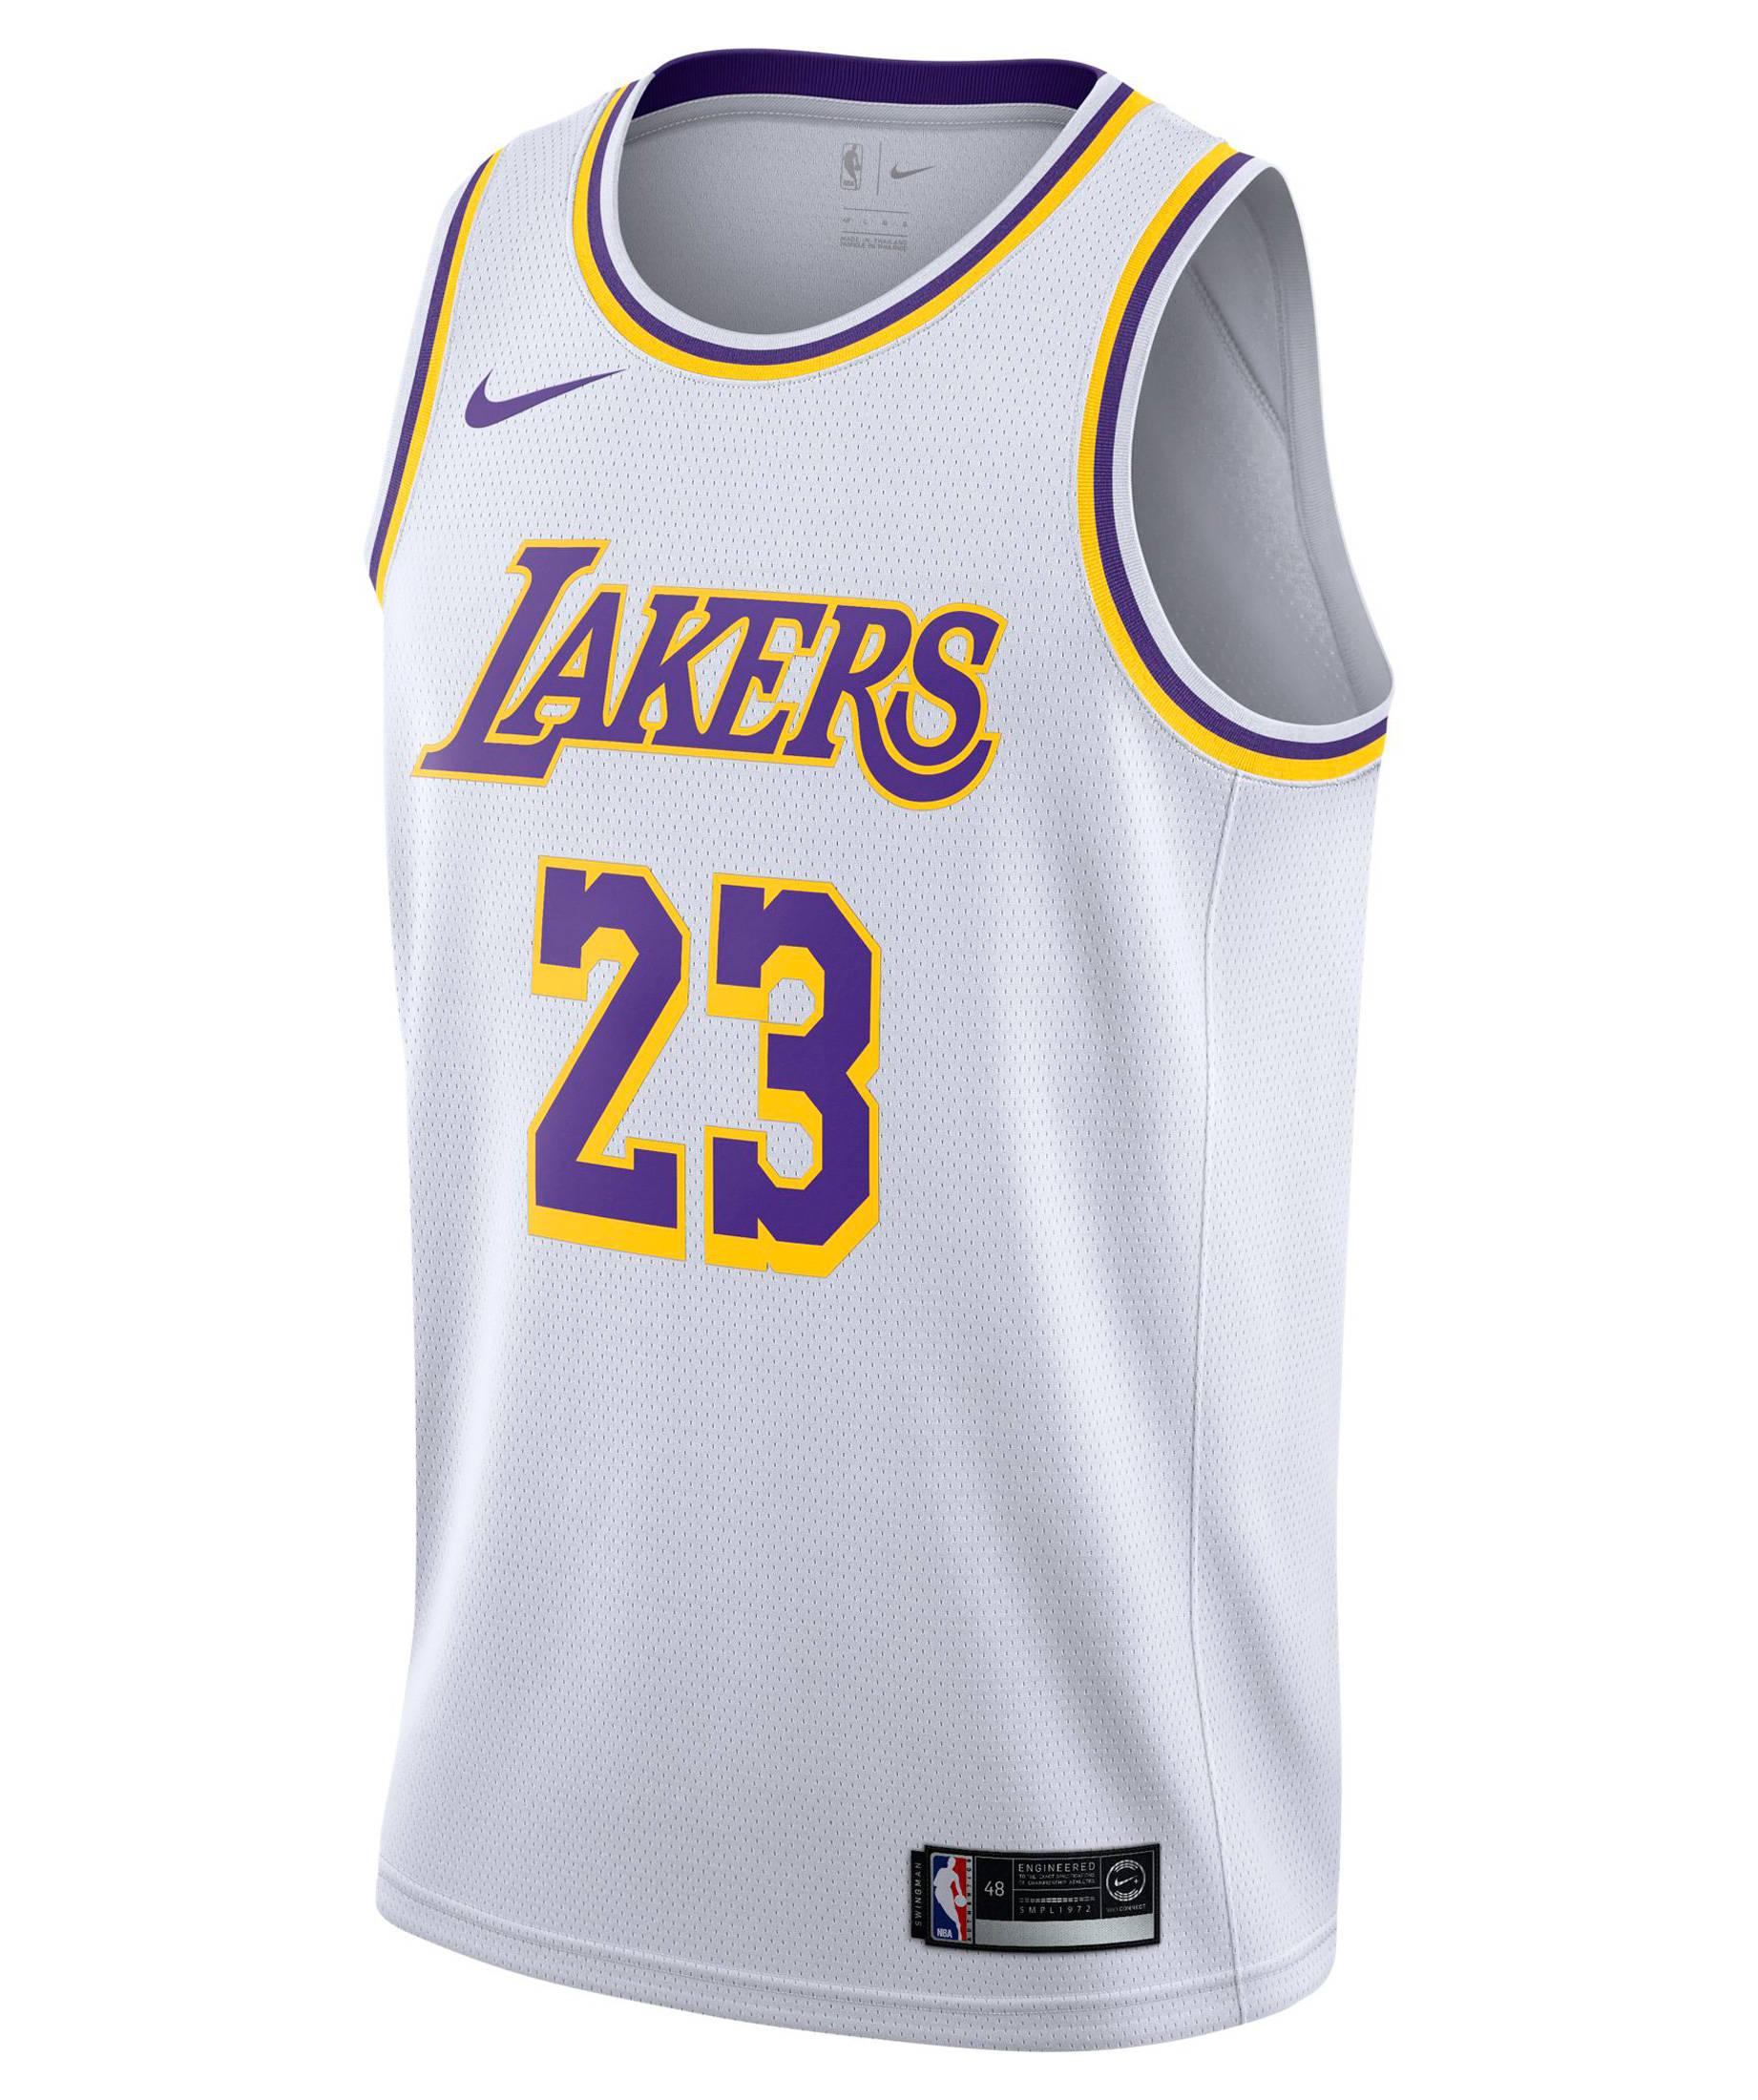 wholesale dealer 652f1 cfaf5 Herren Basketball-Trikot